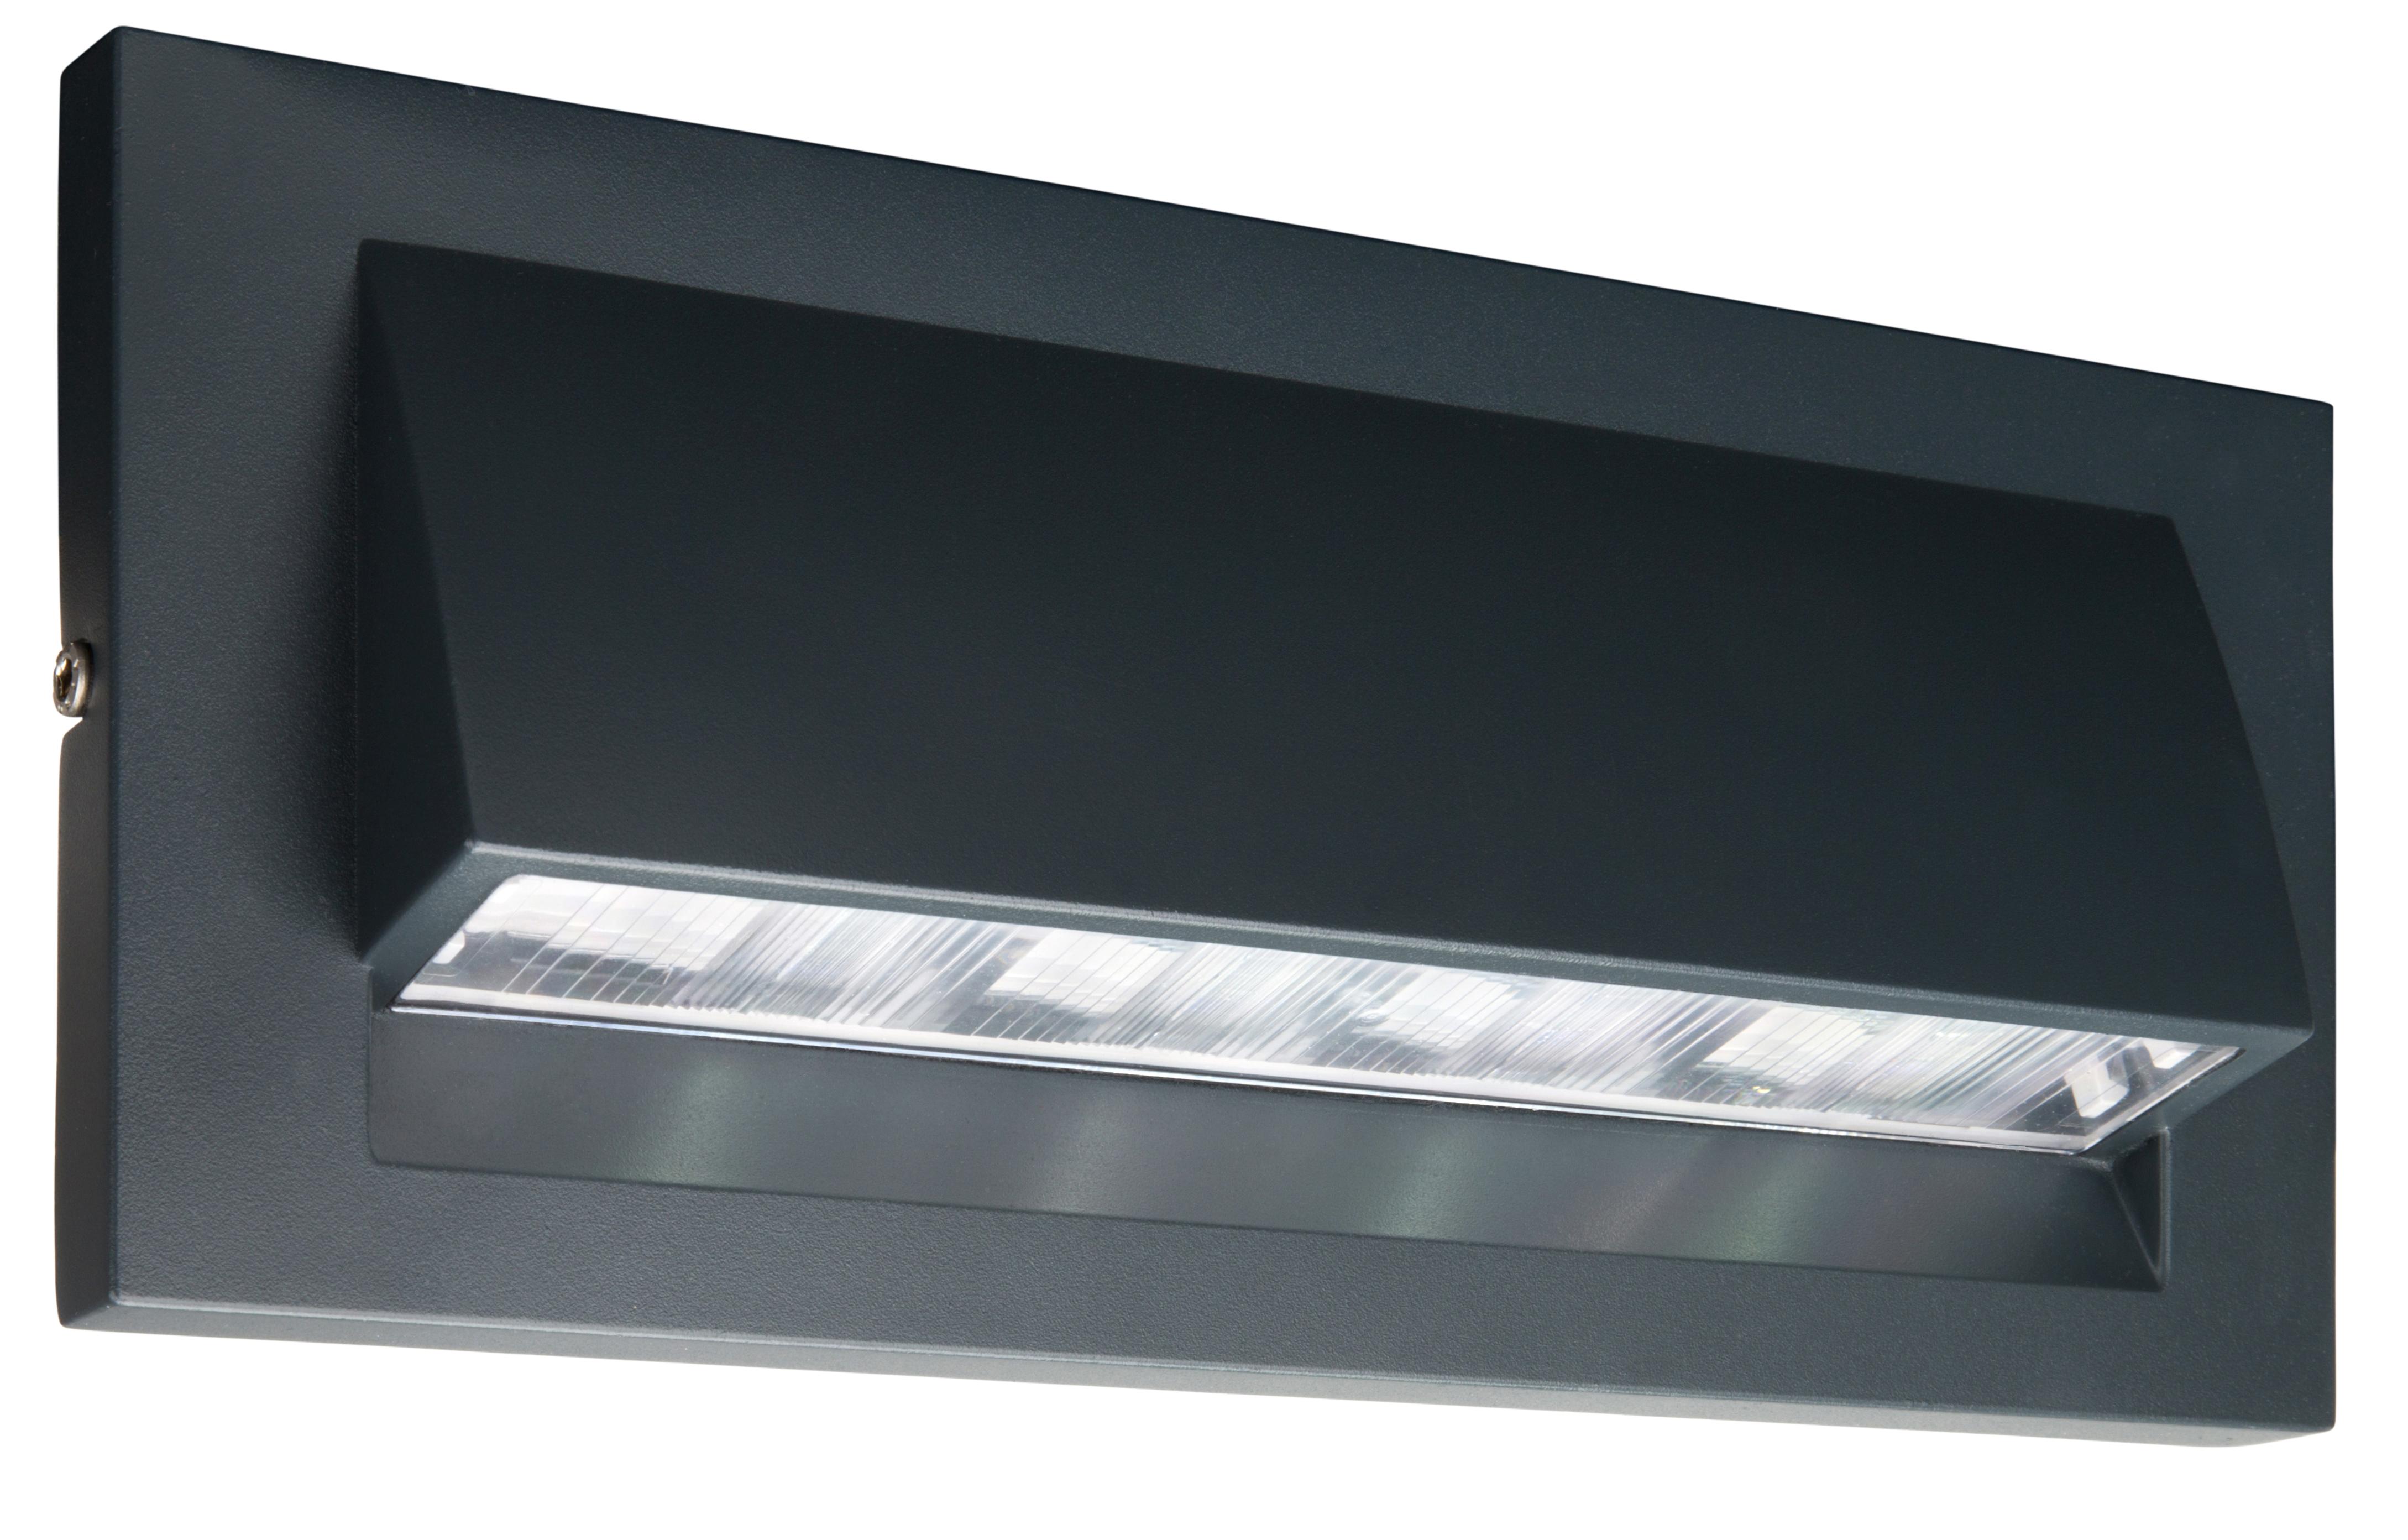 1 Stk Notleuchte ZA Autotest LED 3h/8h 230VAC Wandmontage NLZAAC03SC